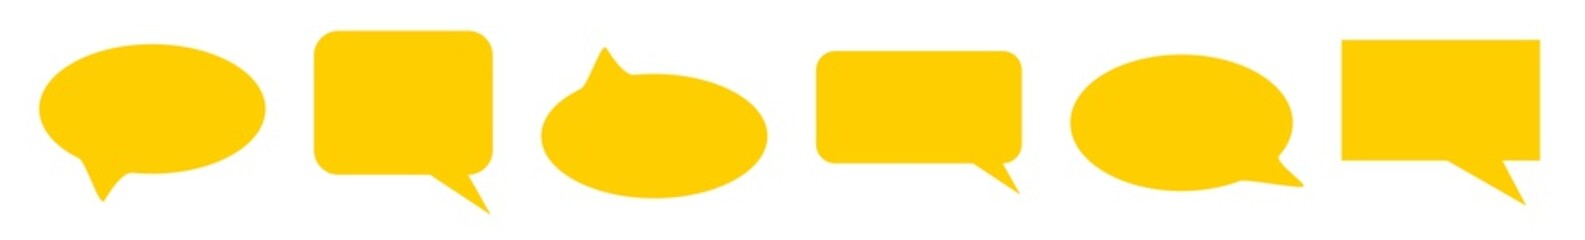 Speech Bubble Balloon Icon yellow | Blank Bubbles | Communication Symbol | Message Logo | Cartoon Sign | Isolated | Variations Fototapete